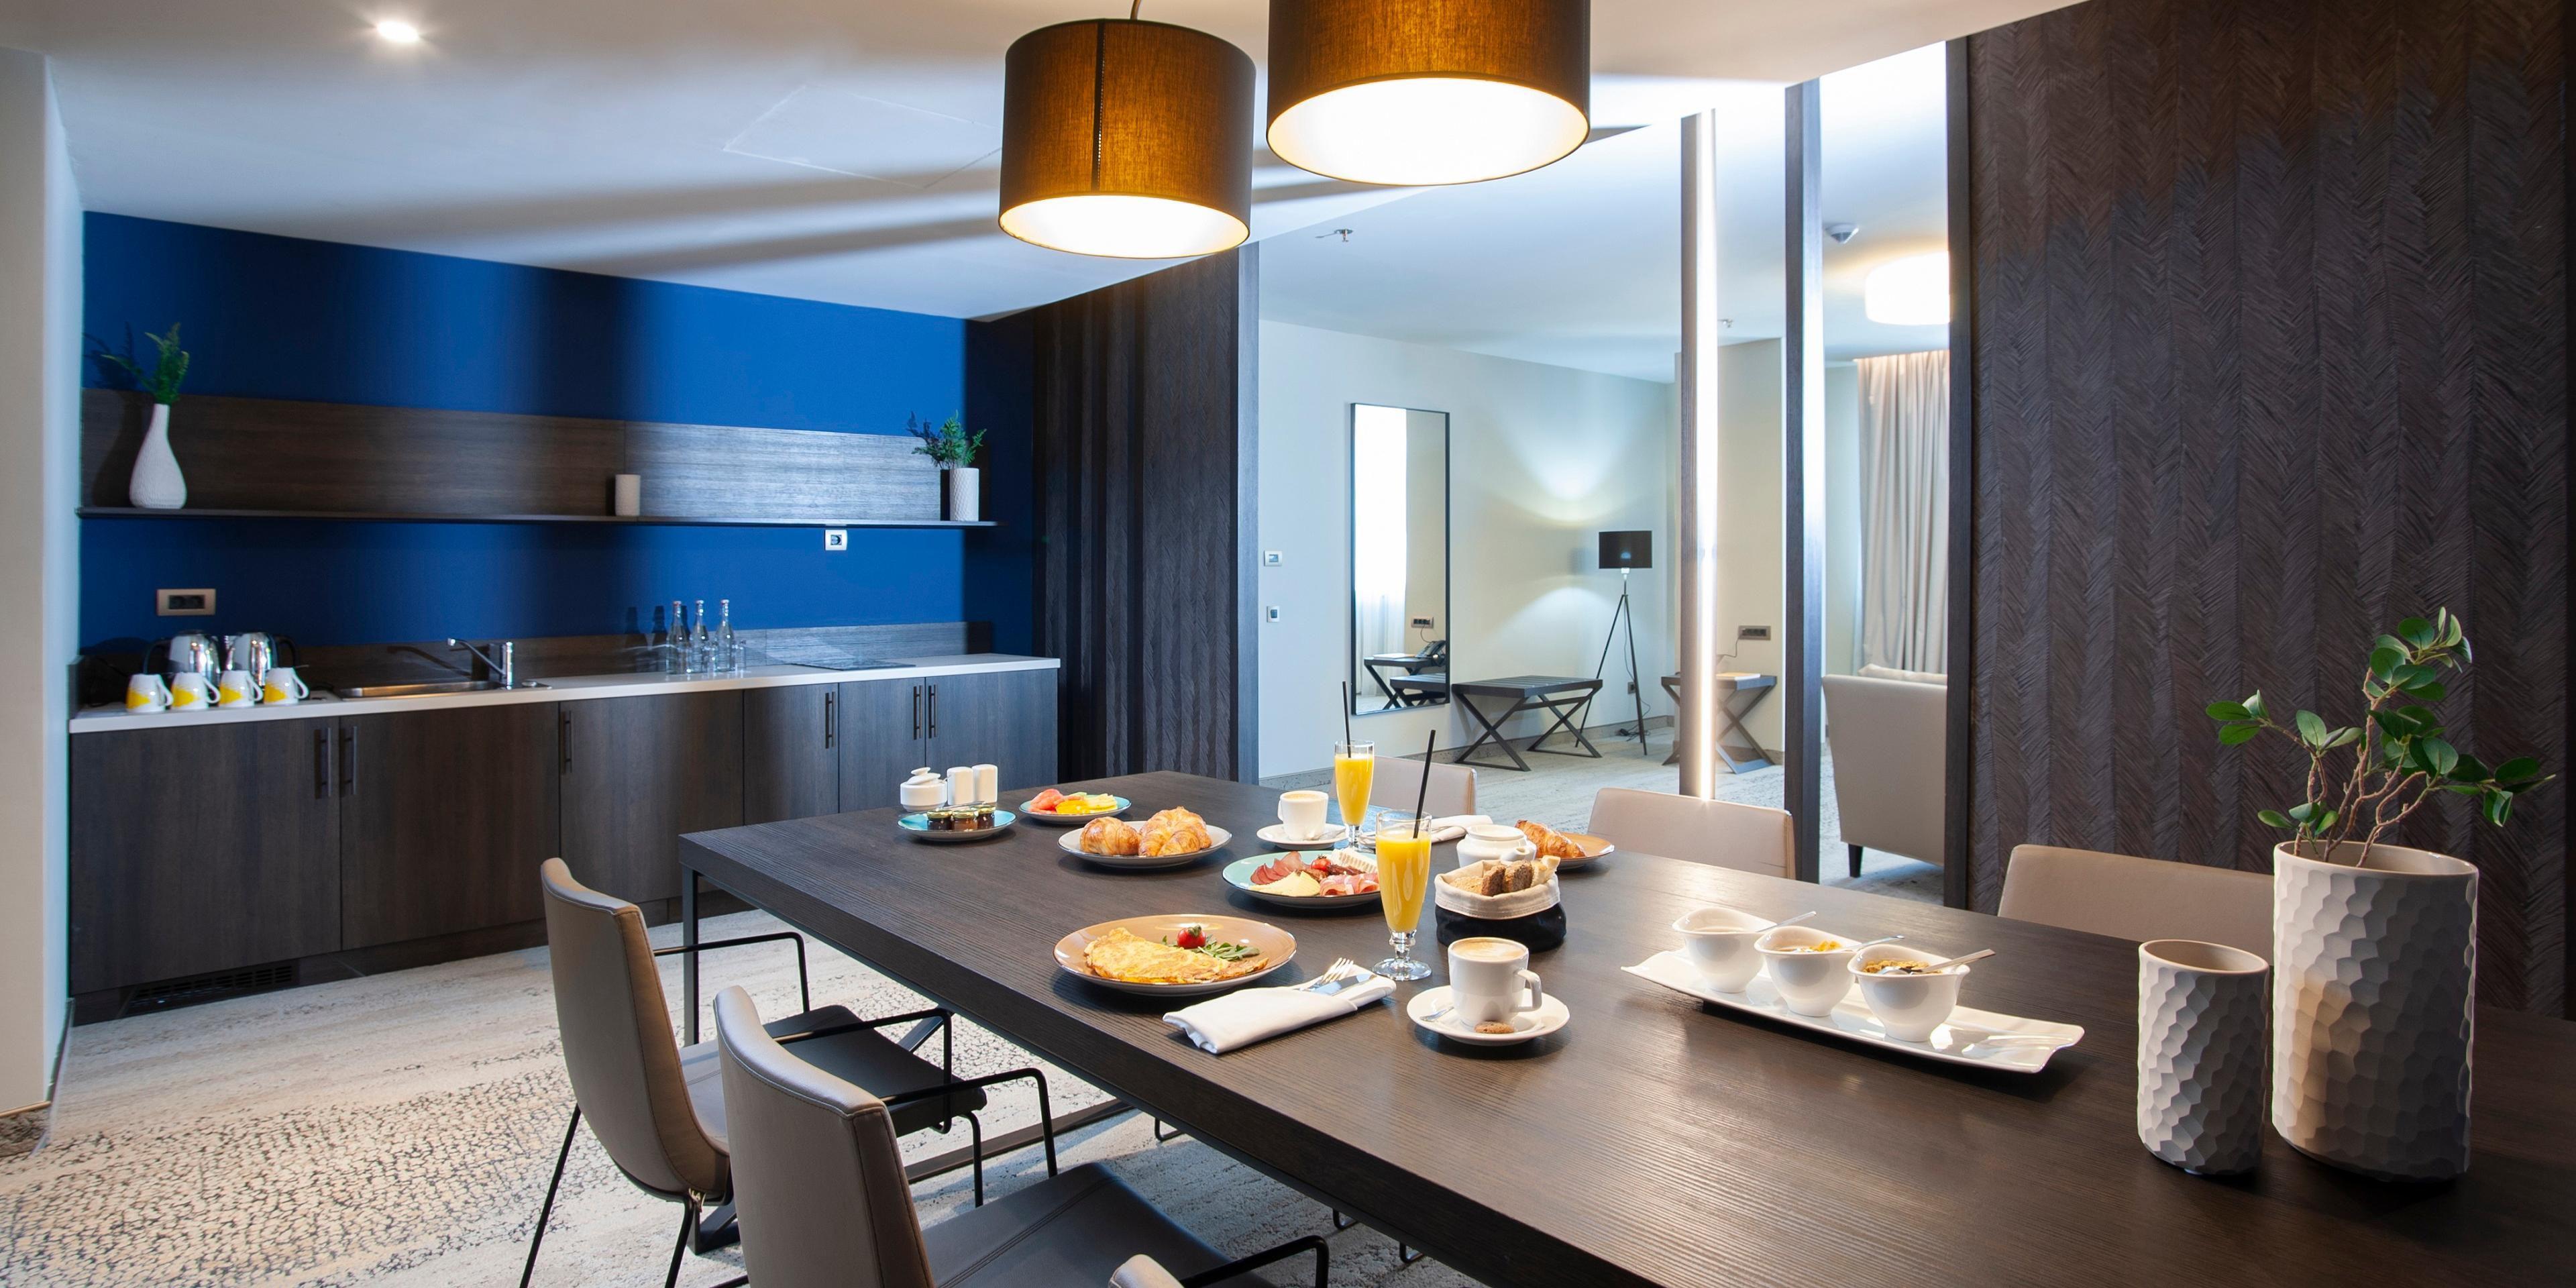 2 bdrm suite 2 king living room breakfast 2